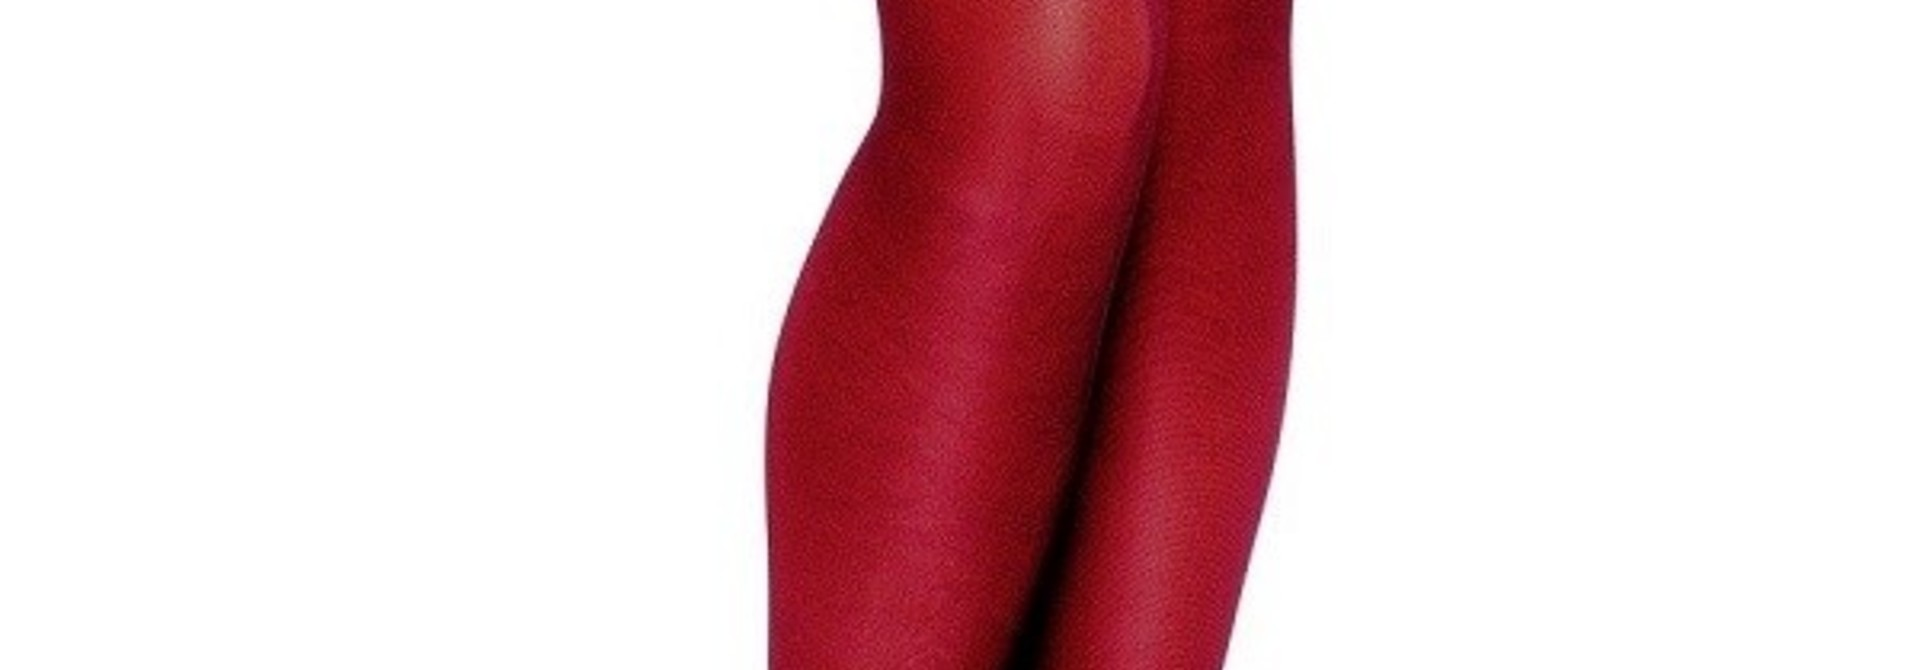 Rode Jarretelkousen 20DEN